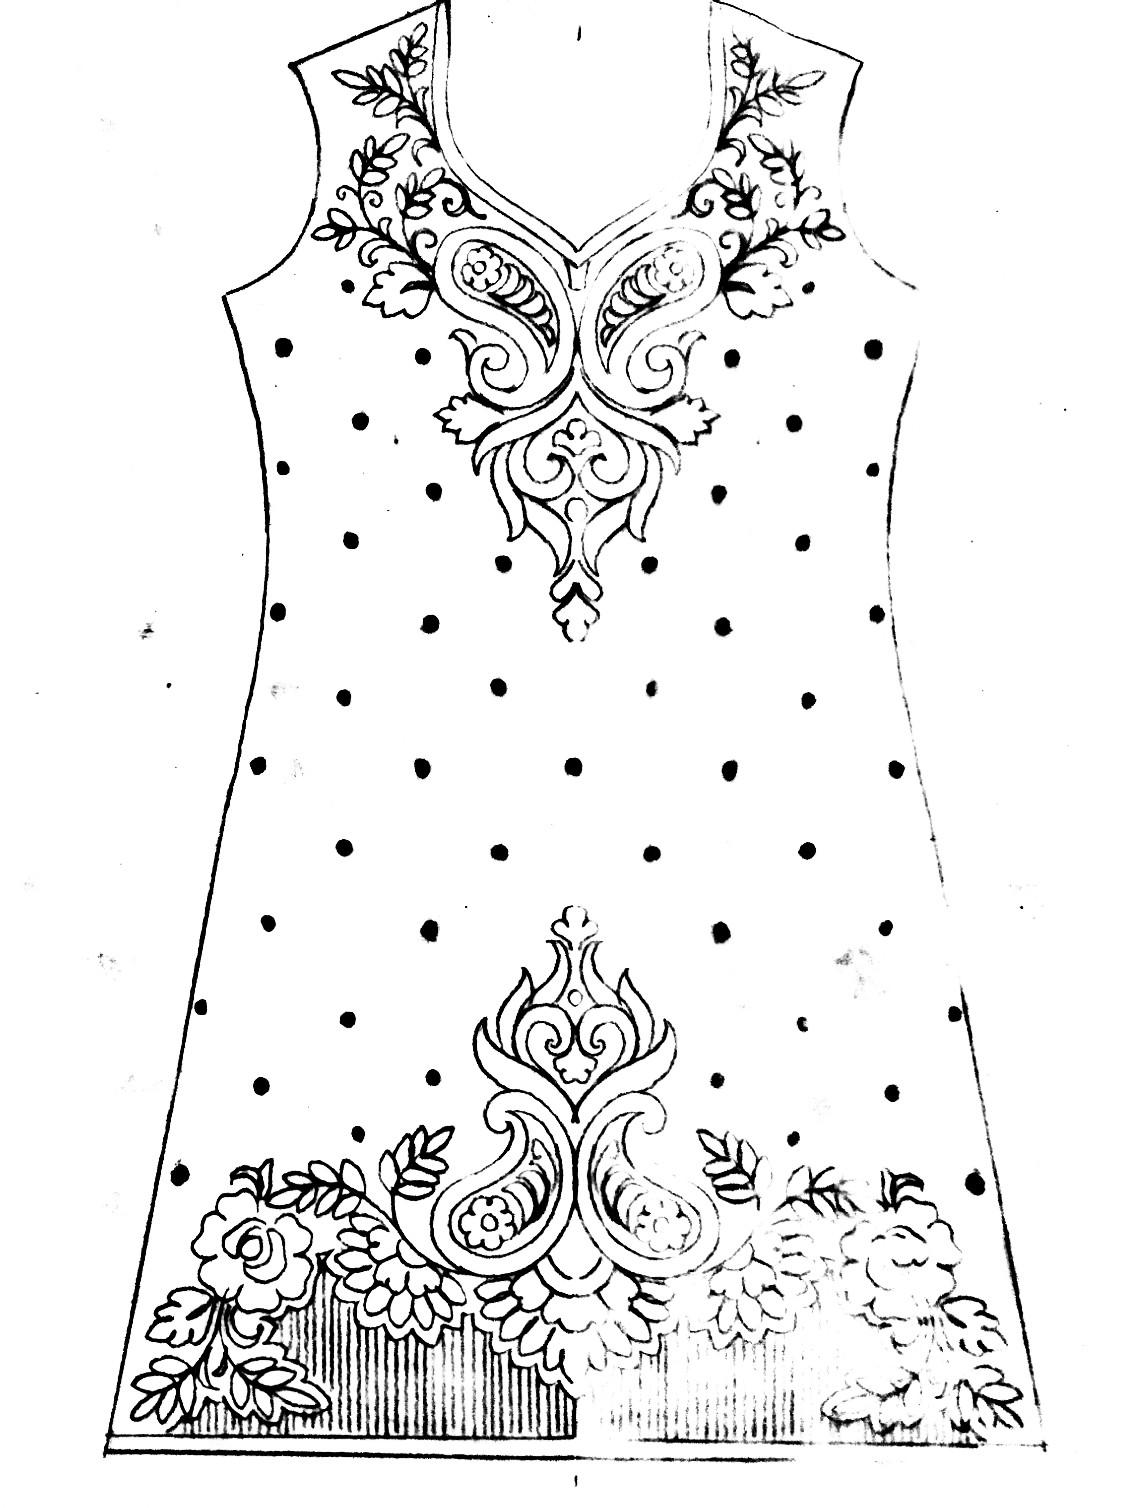 Essay Drawing tutorial for hand emroidery dress design /ladies suit design patterns pencil sketch for fashion designer.